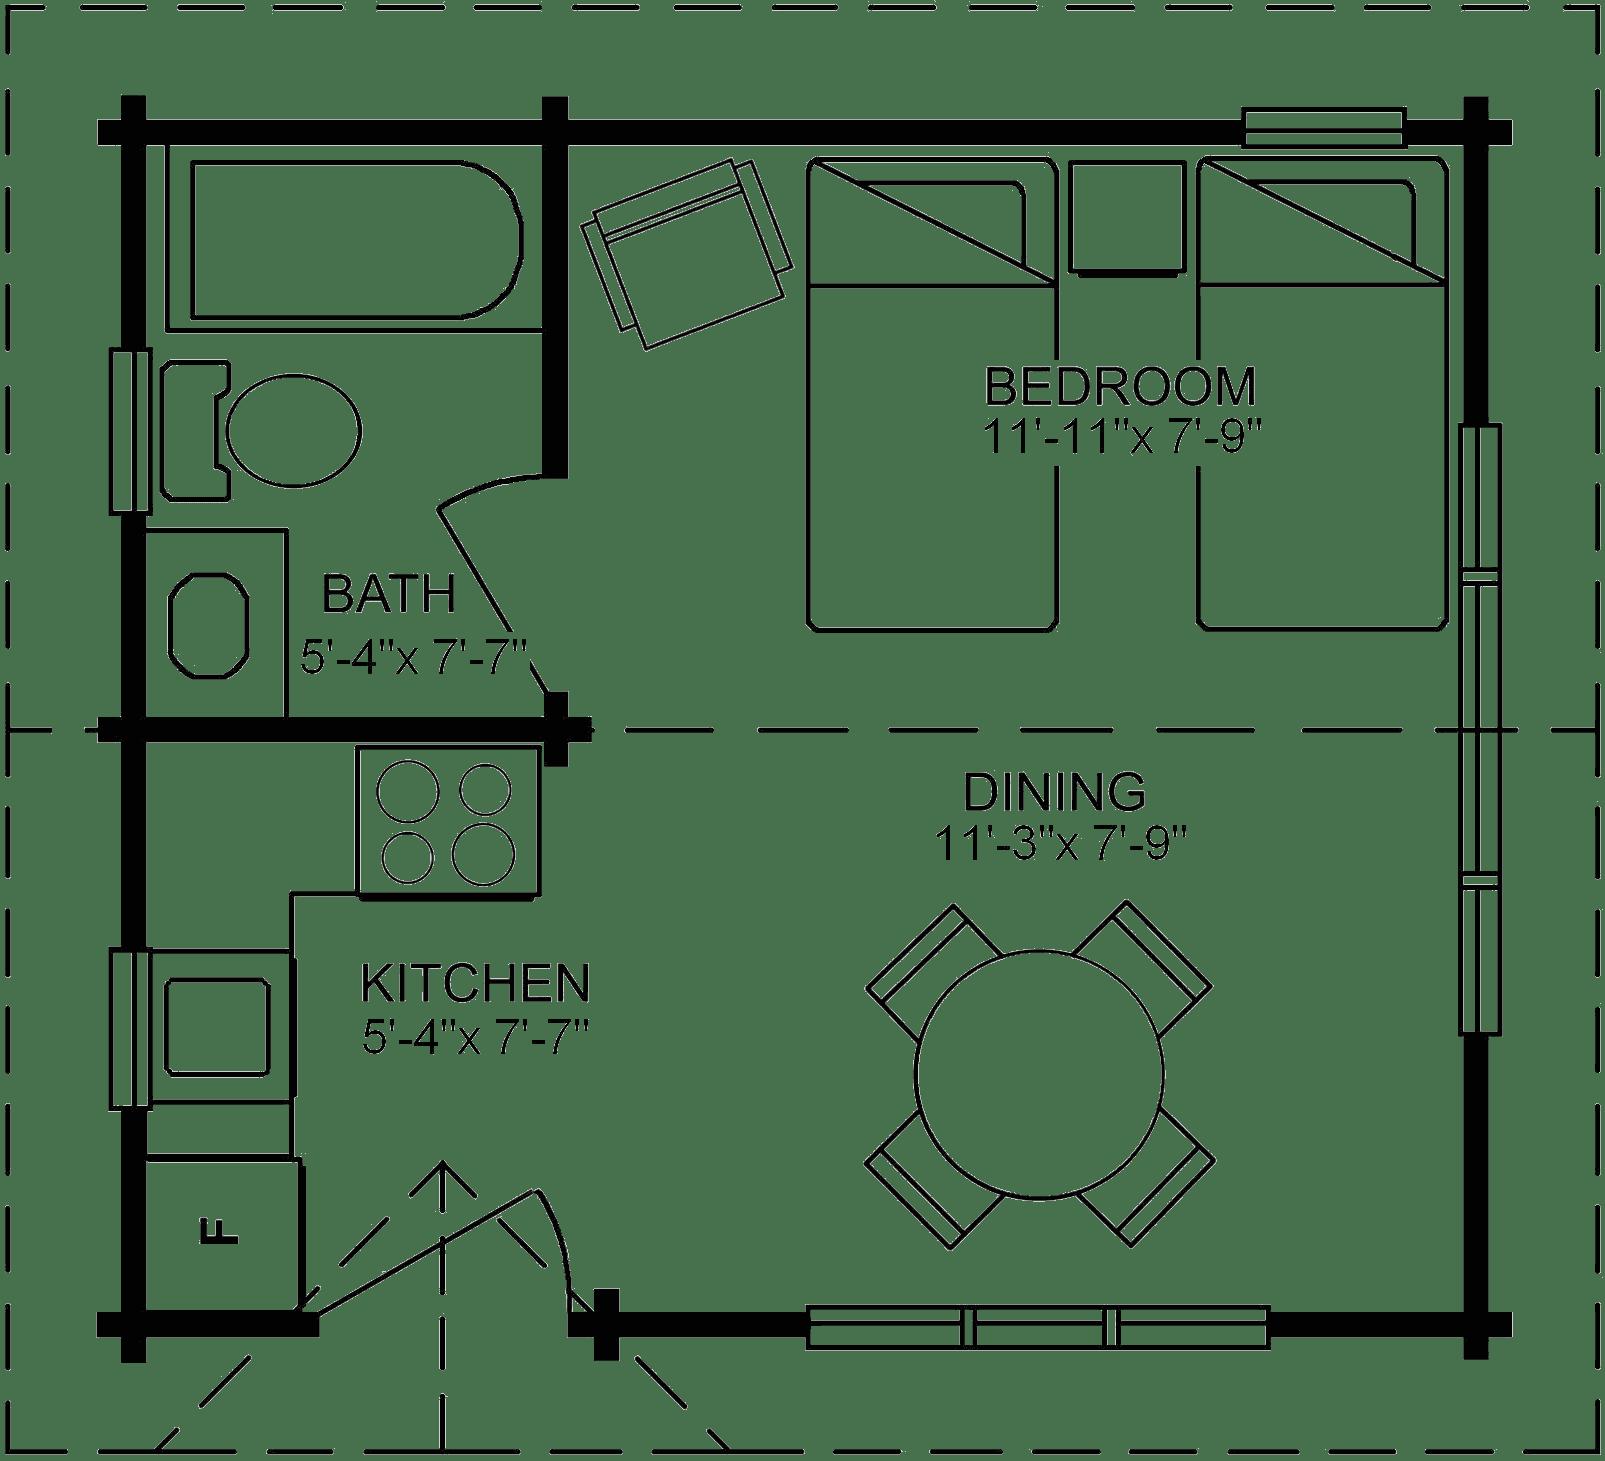 hight resolution of 3 1 1 teton floor plan main floor